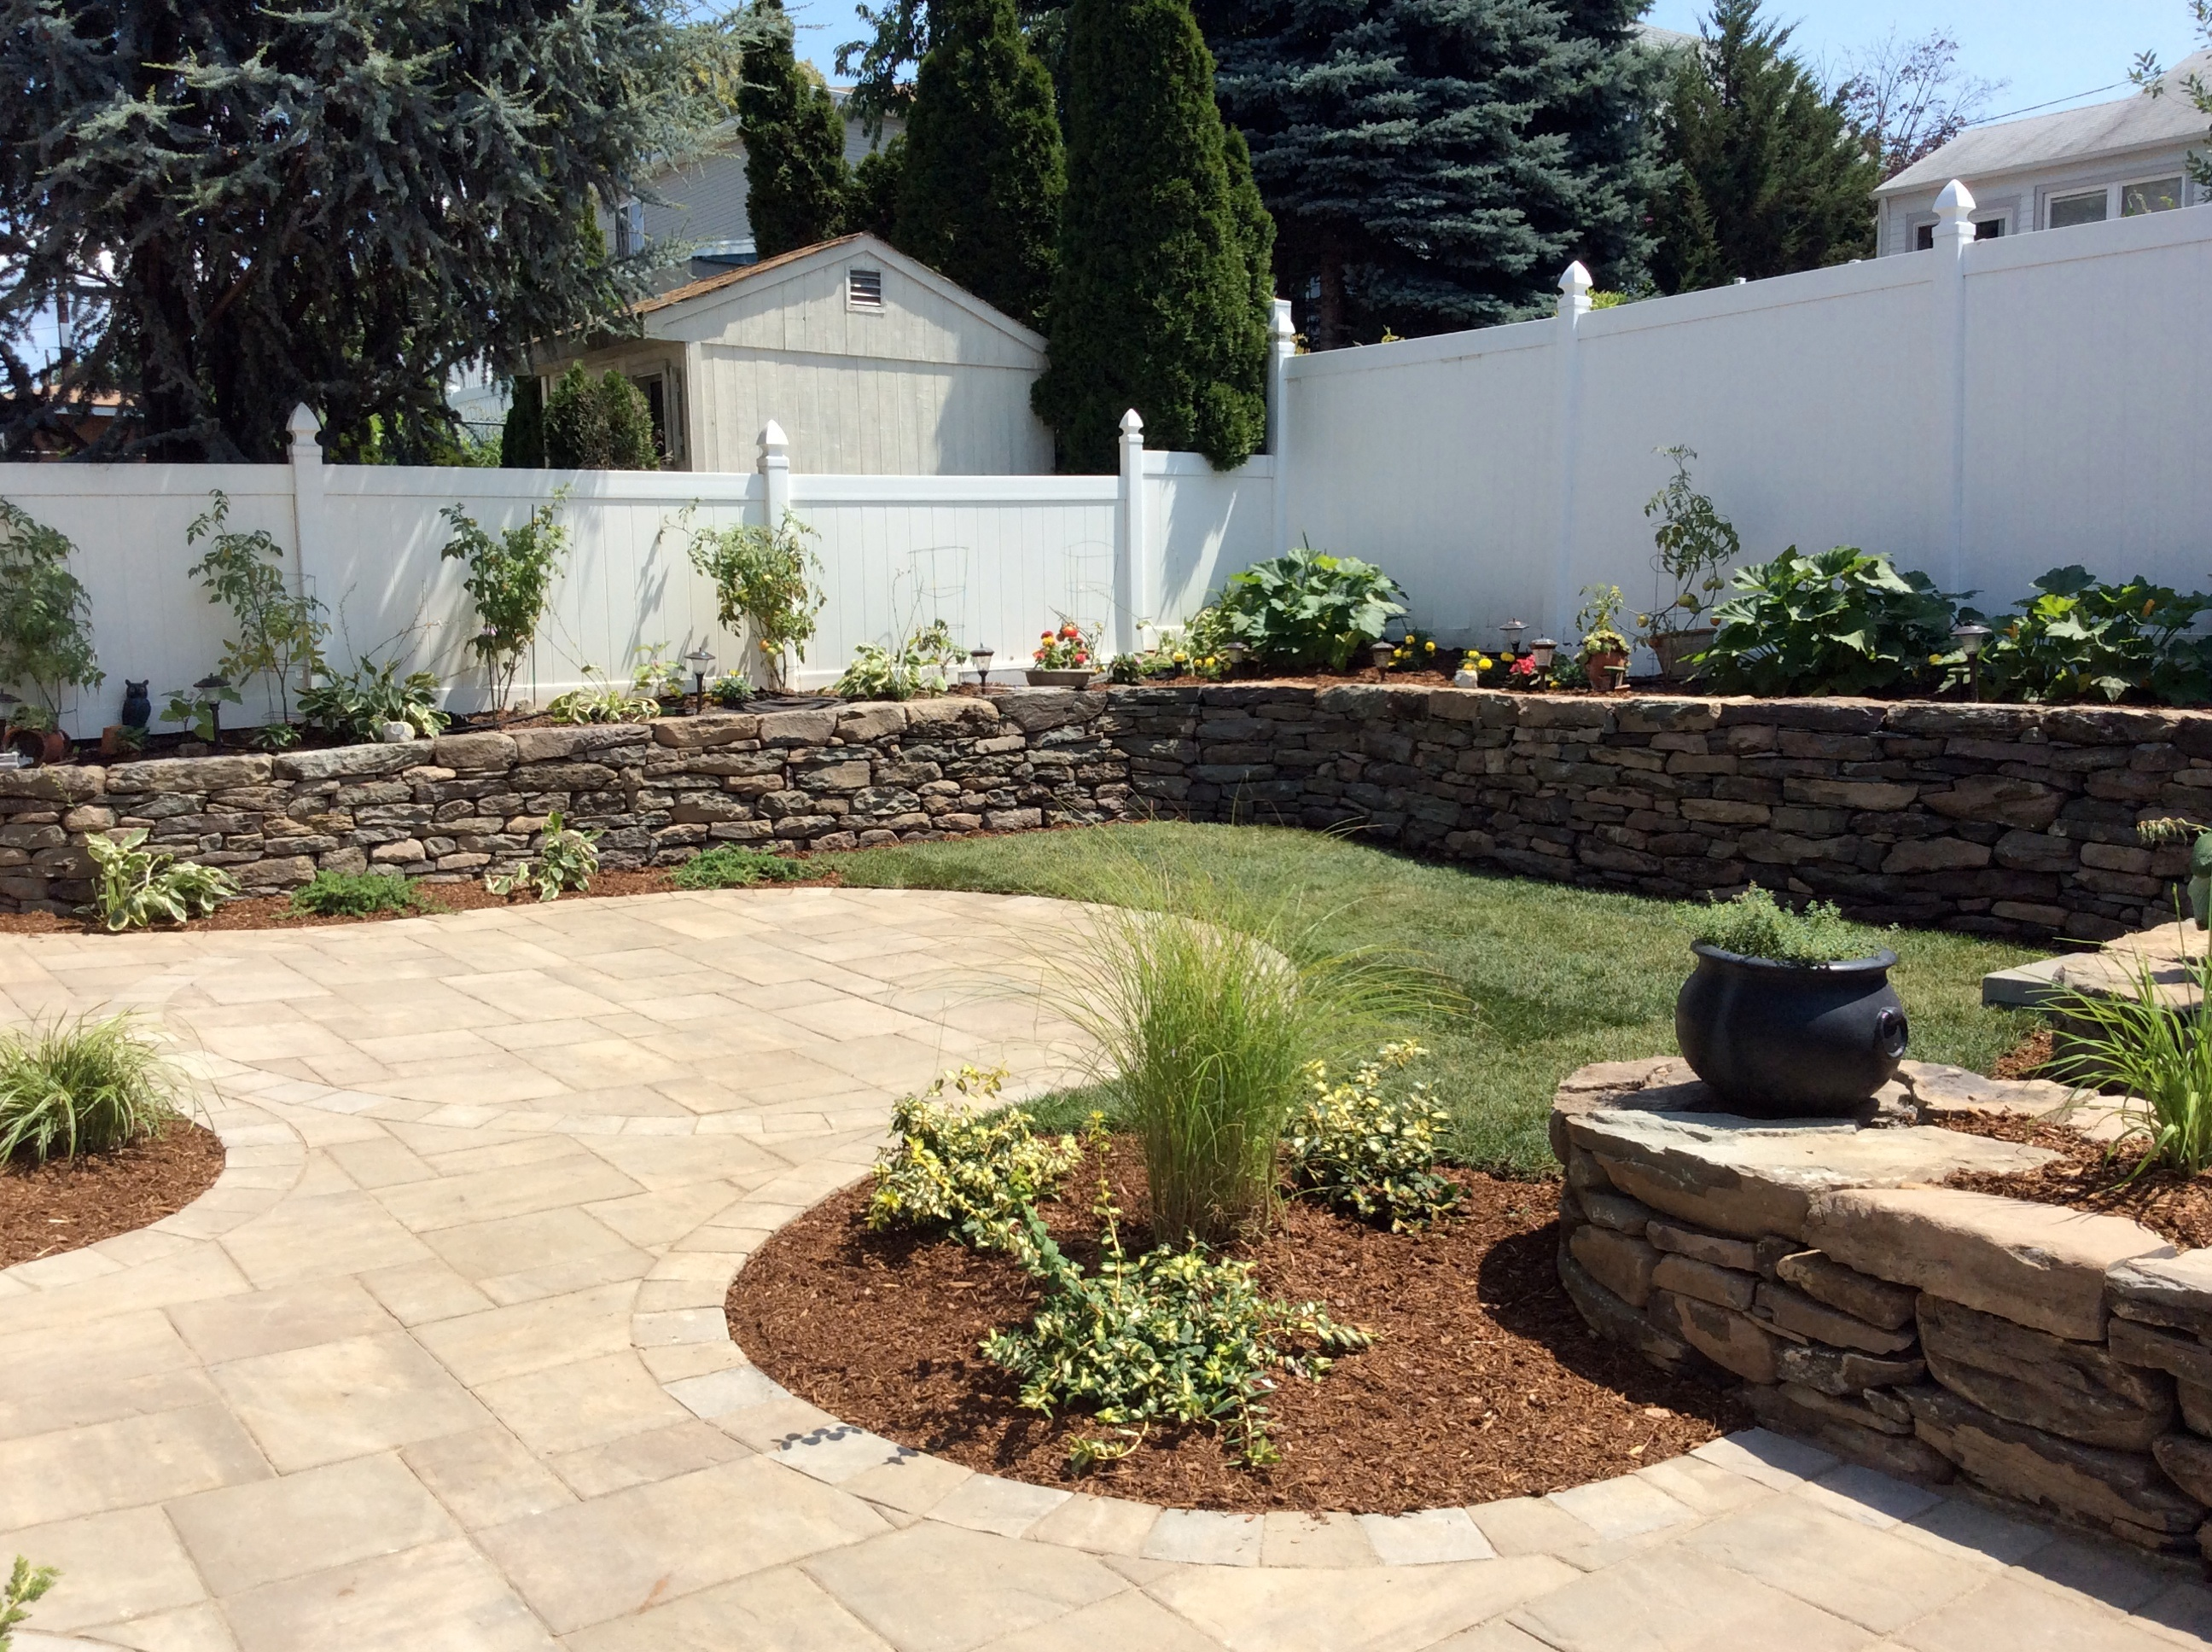 Joe antine landscape design contractor bergen county for Landscape design contractors